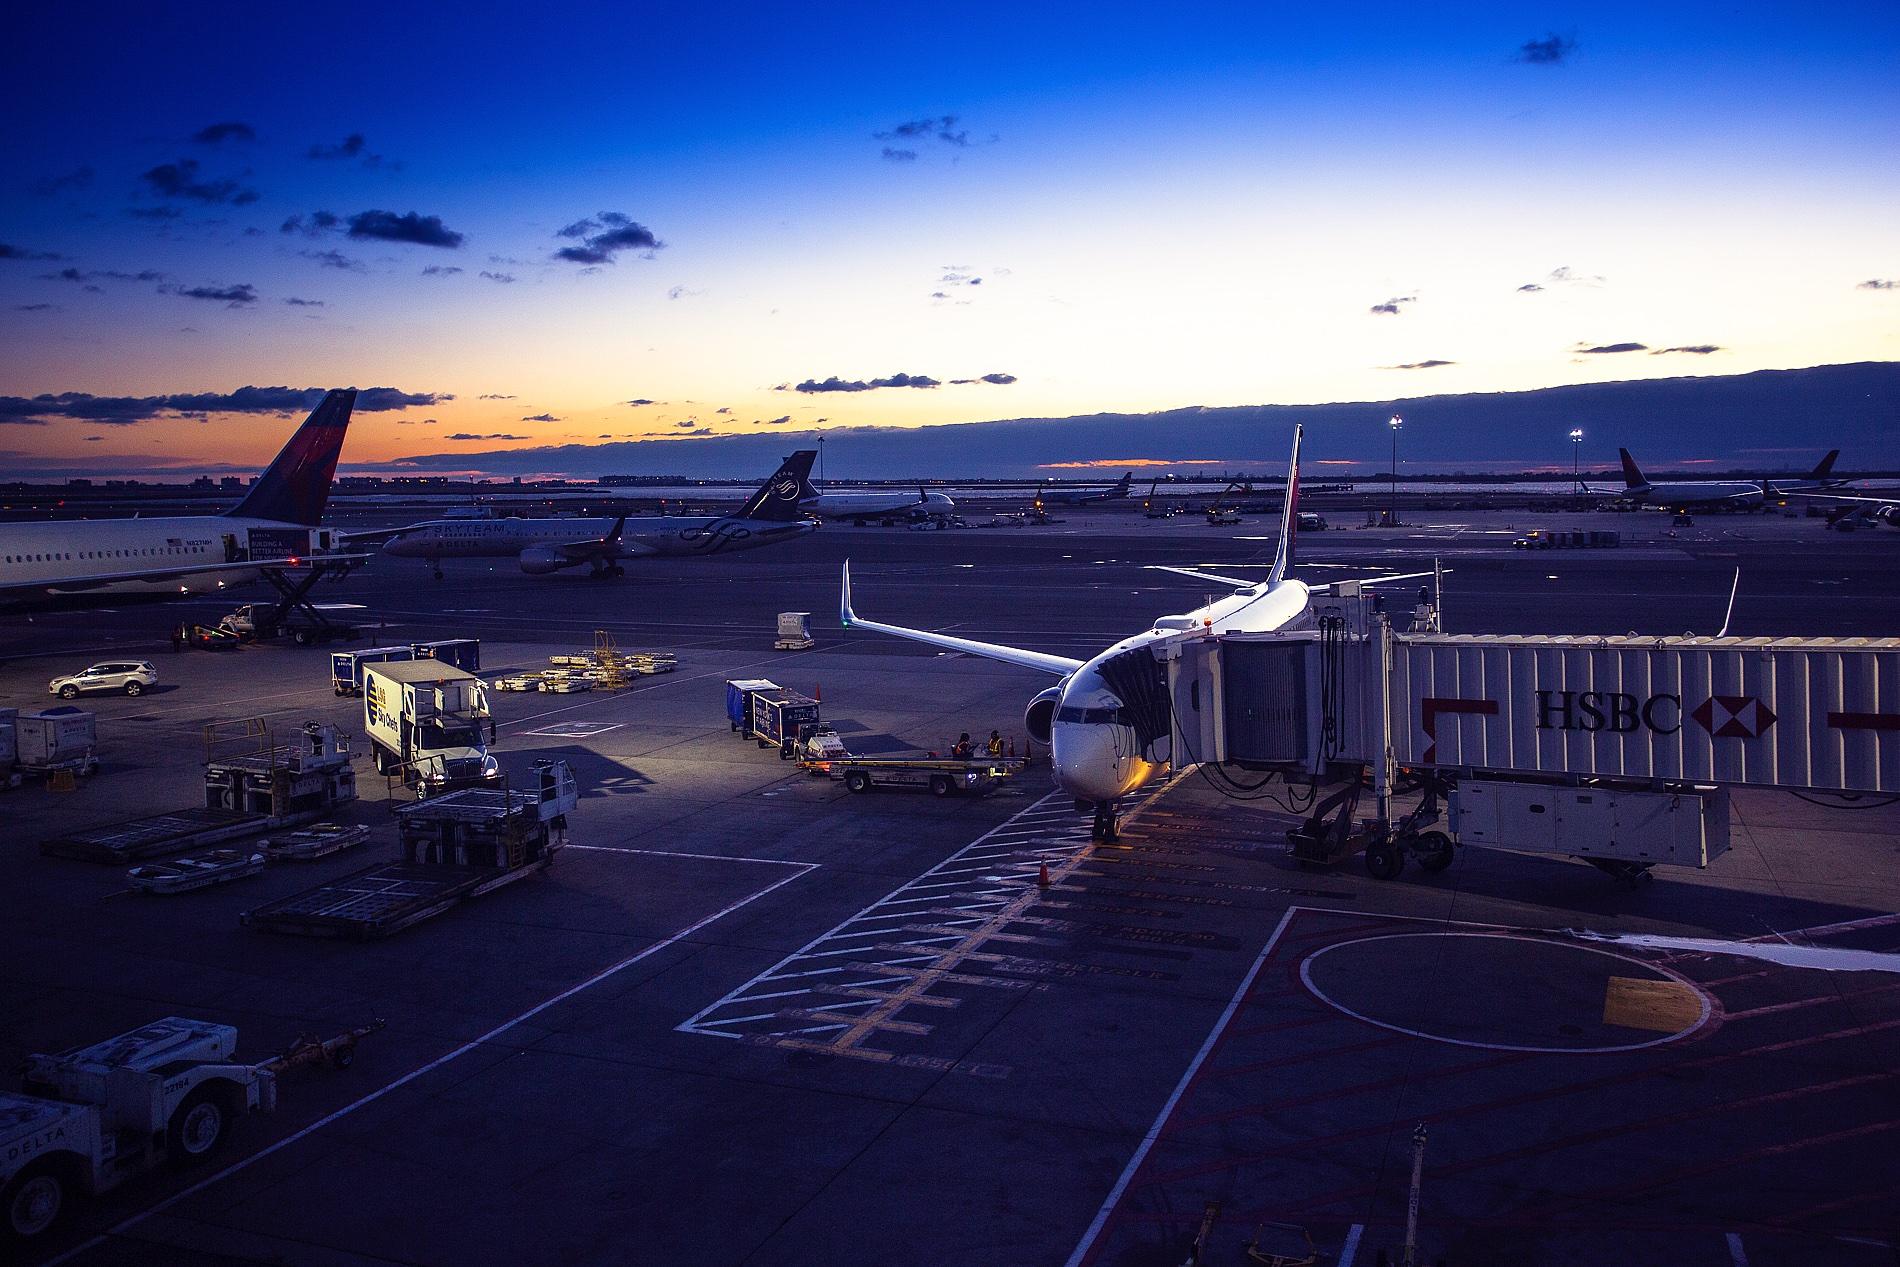 jfk airport new york evening light